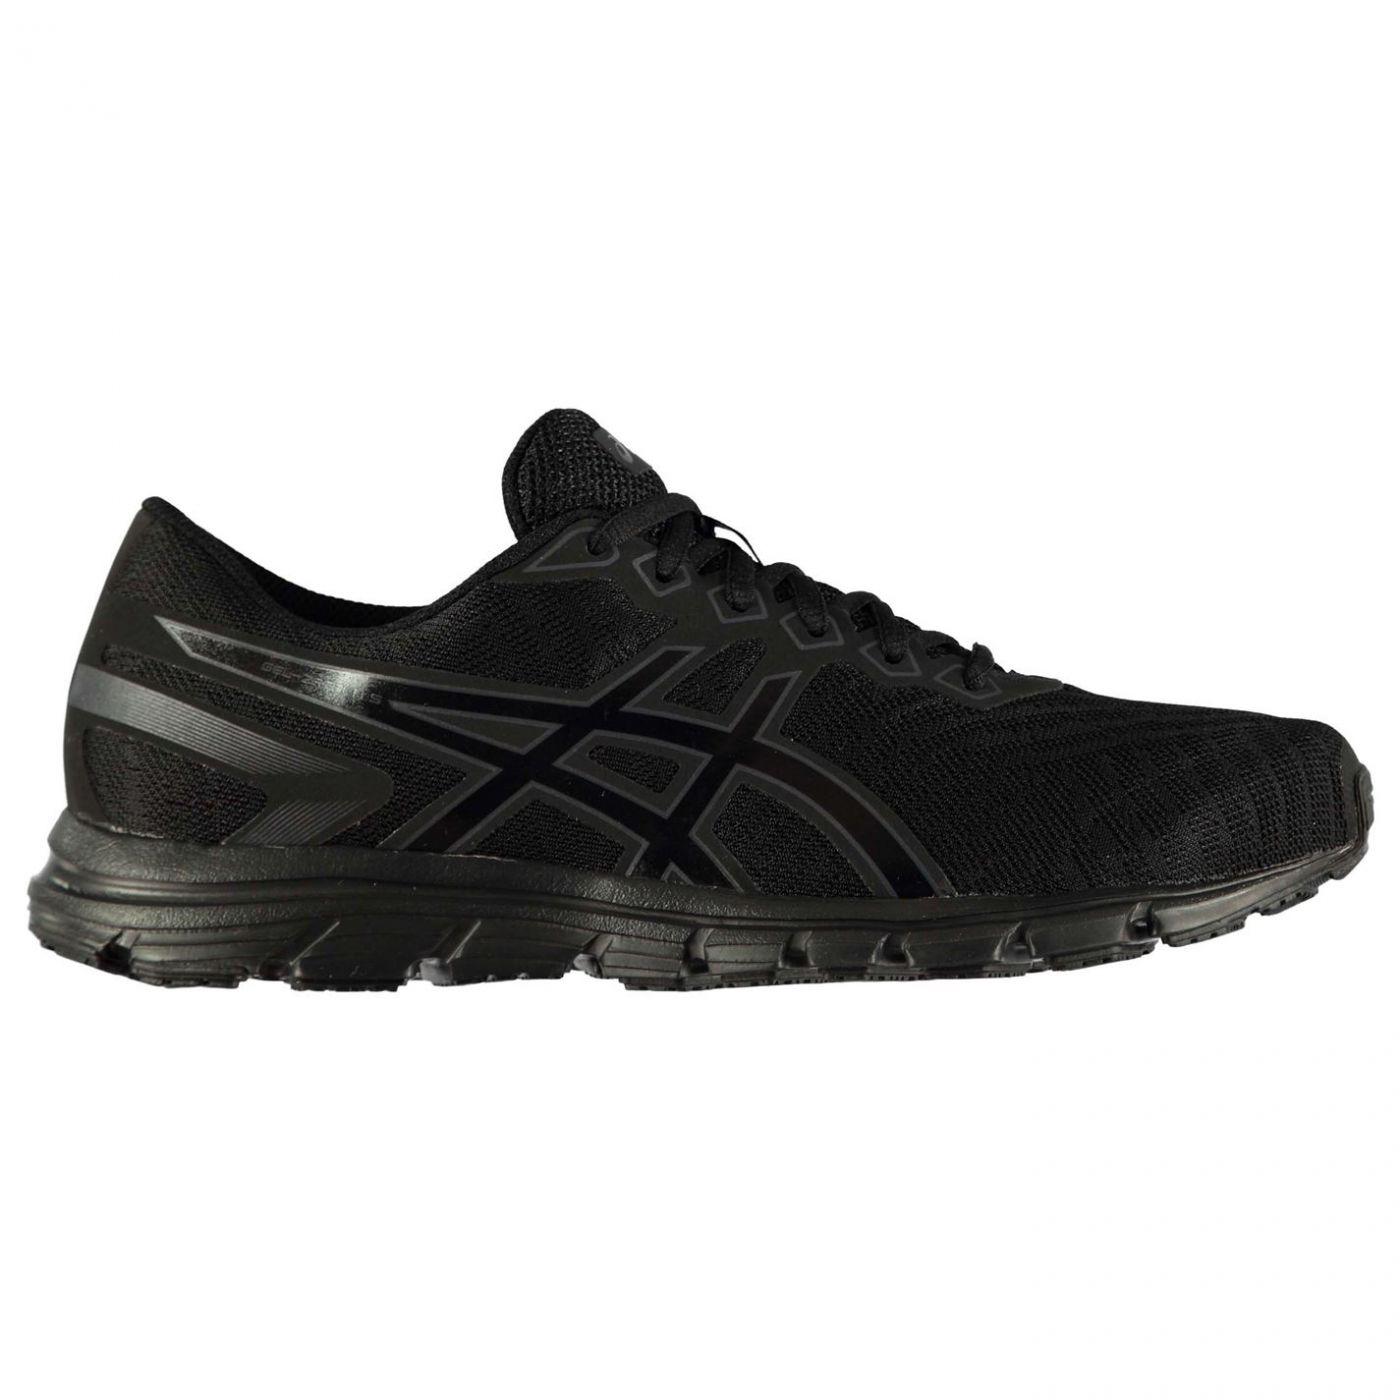 Asics Gel Zaraca 5 Ladies Running Shoes